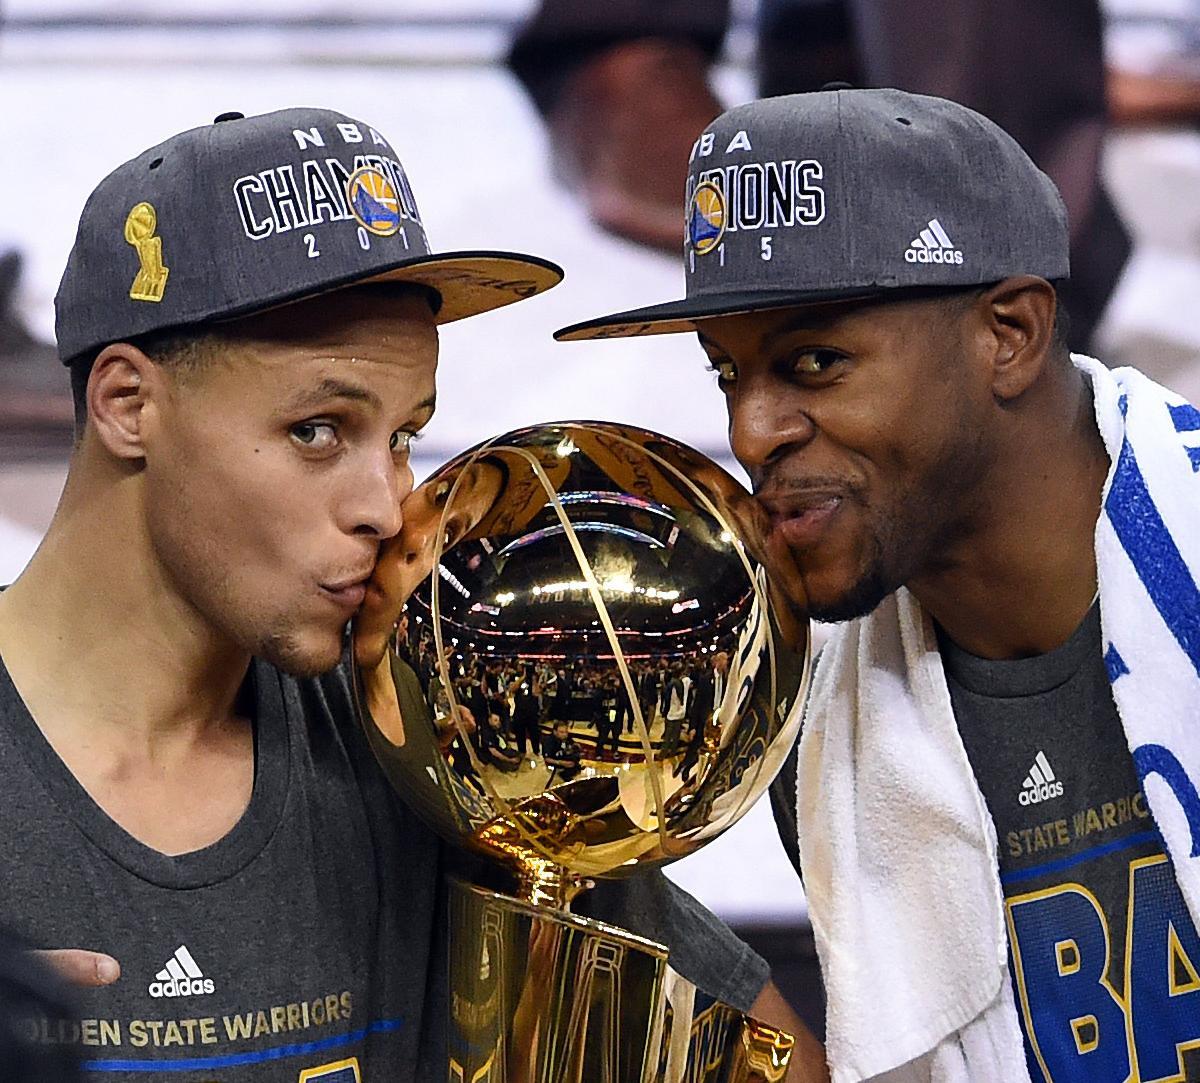 NBA Playoff Bracket 2016: Full Review Of Postseason